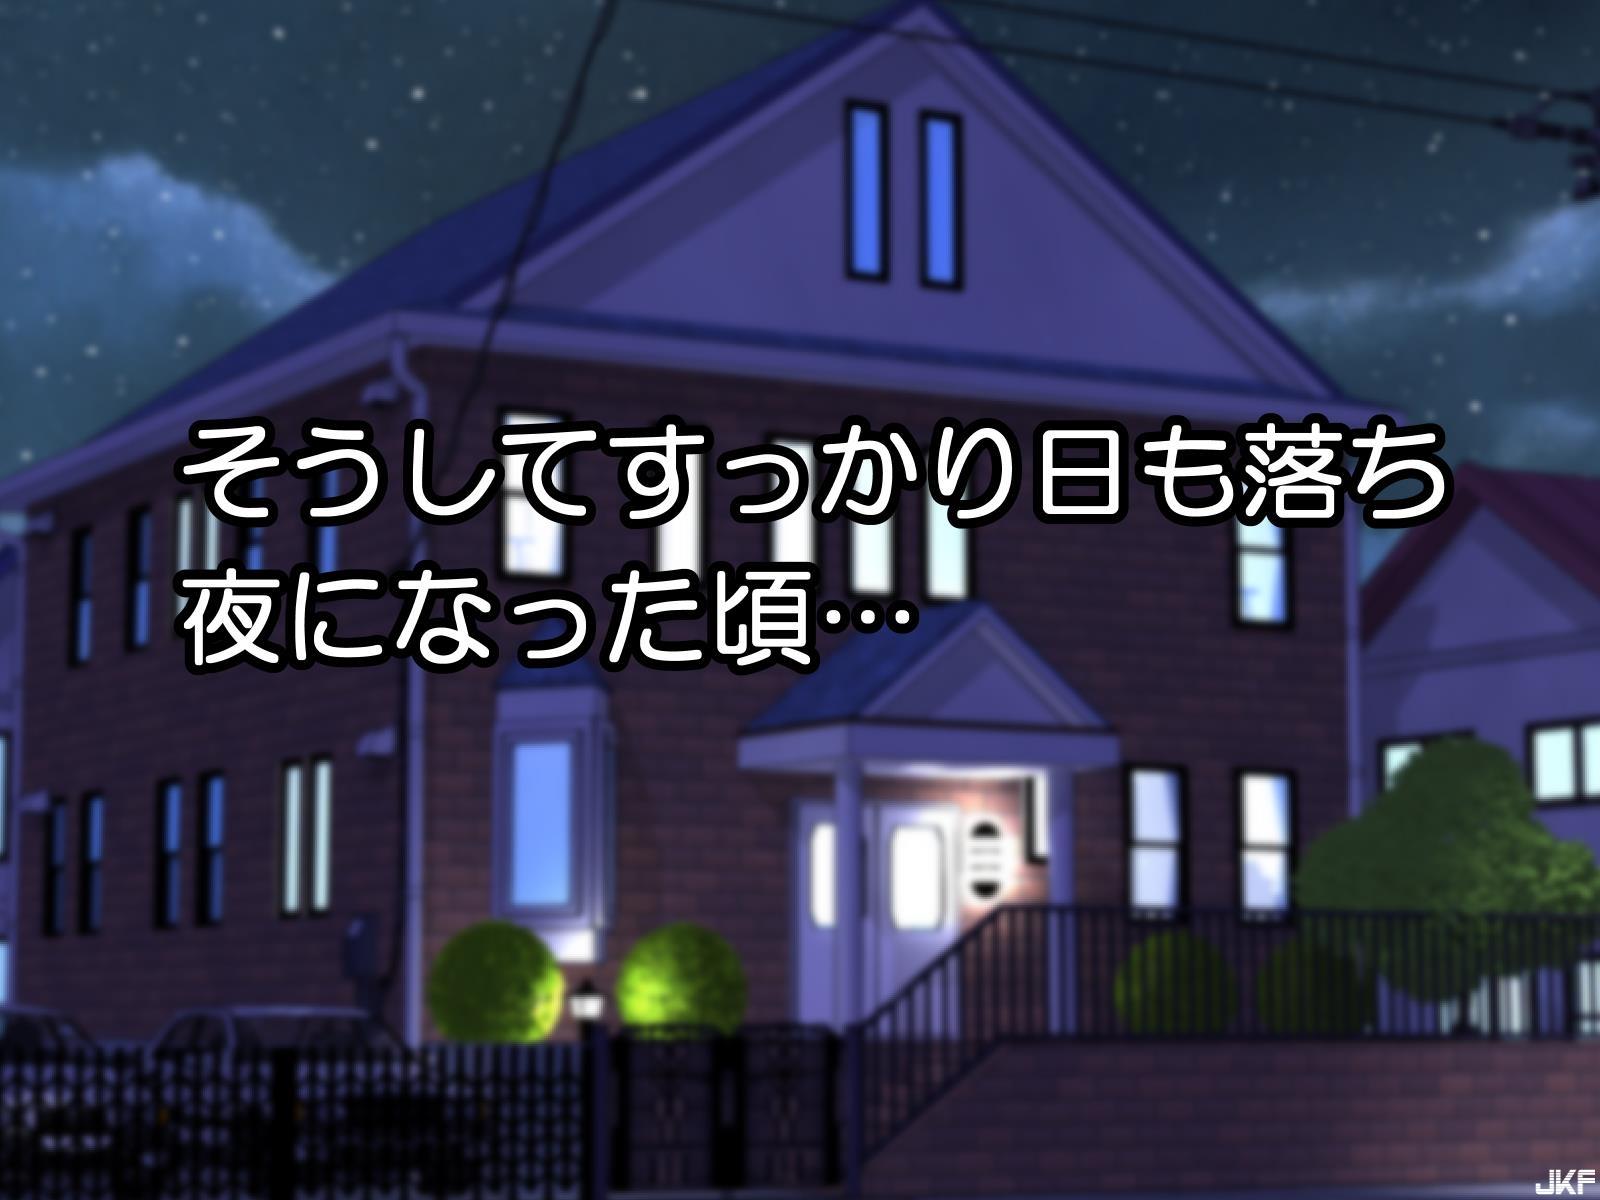 G_048 (Copy).jpg